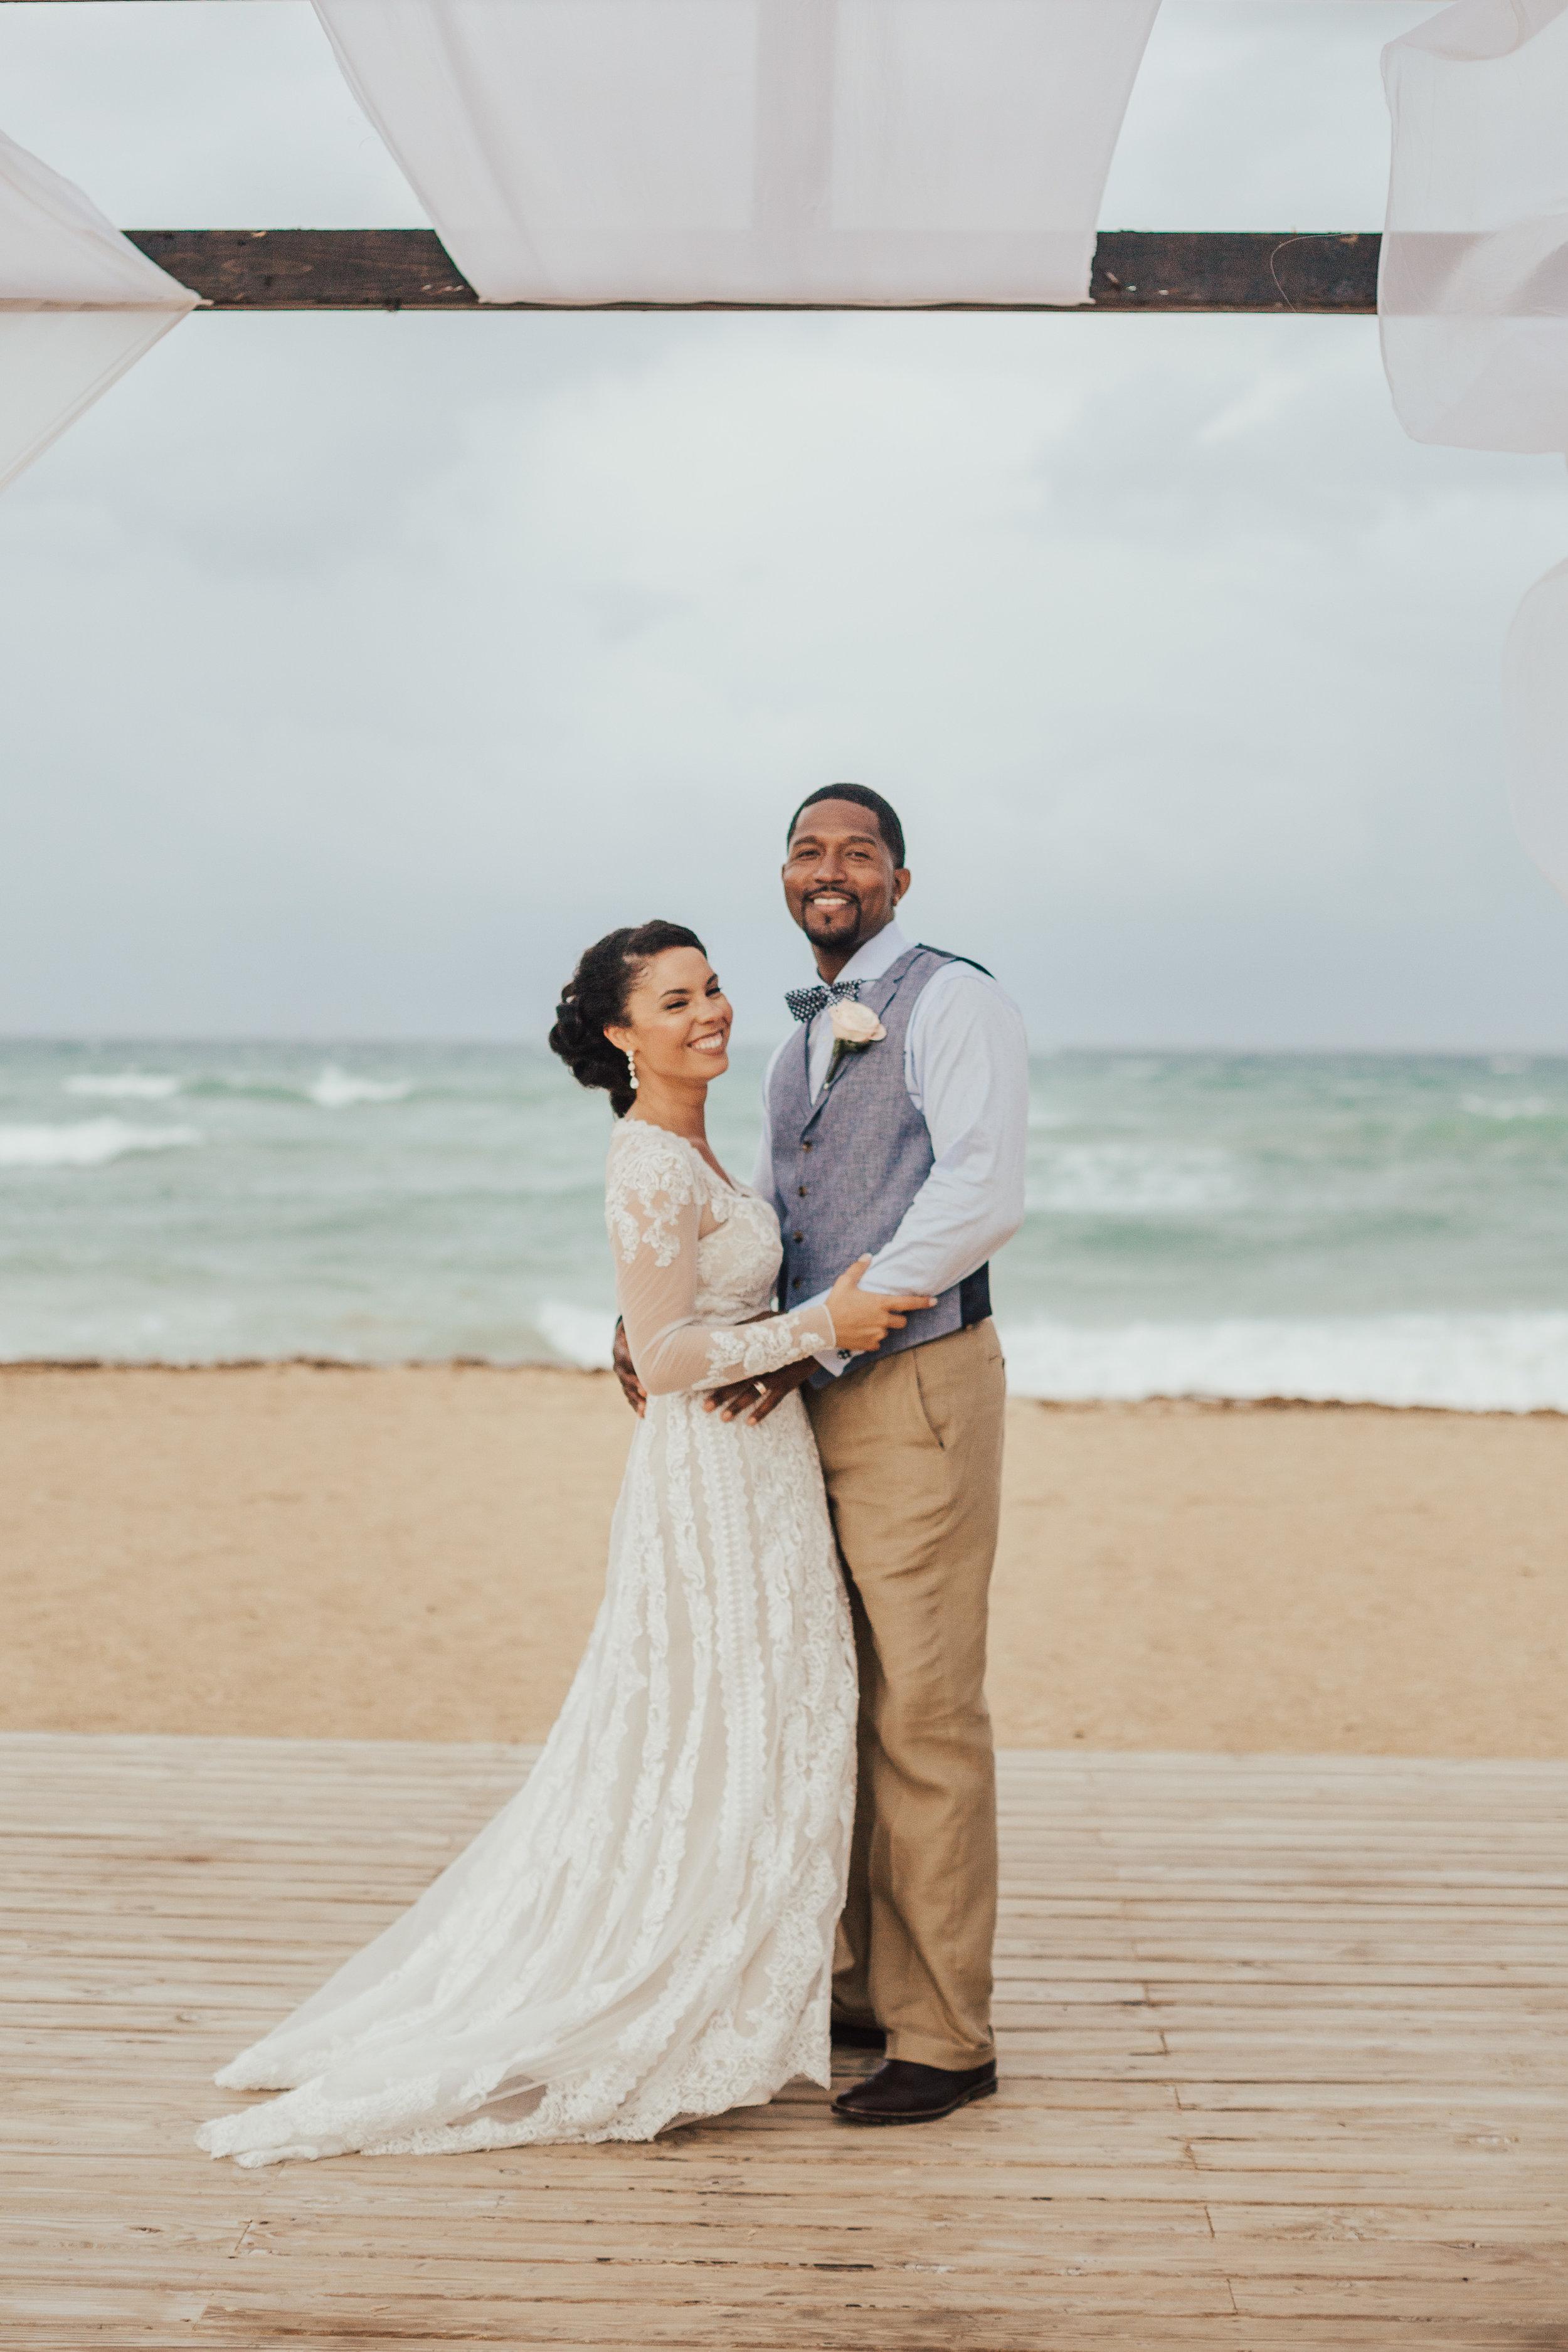 Destination-Wedding-Photographer-cleveland-wedding-photographer-elopement-photographer-elope-cleveland-photographers